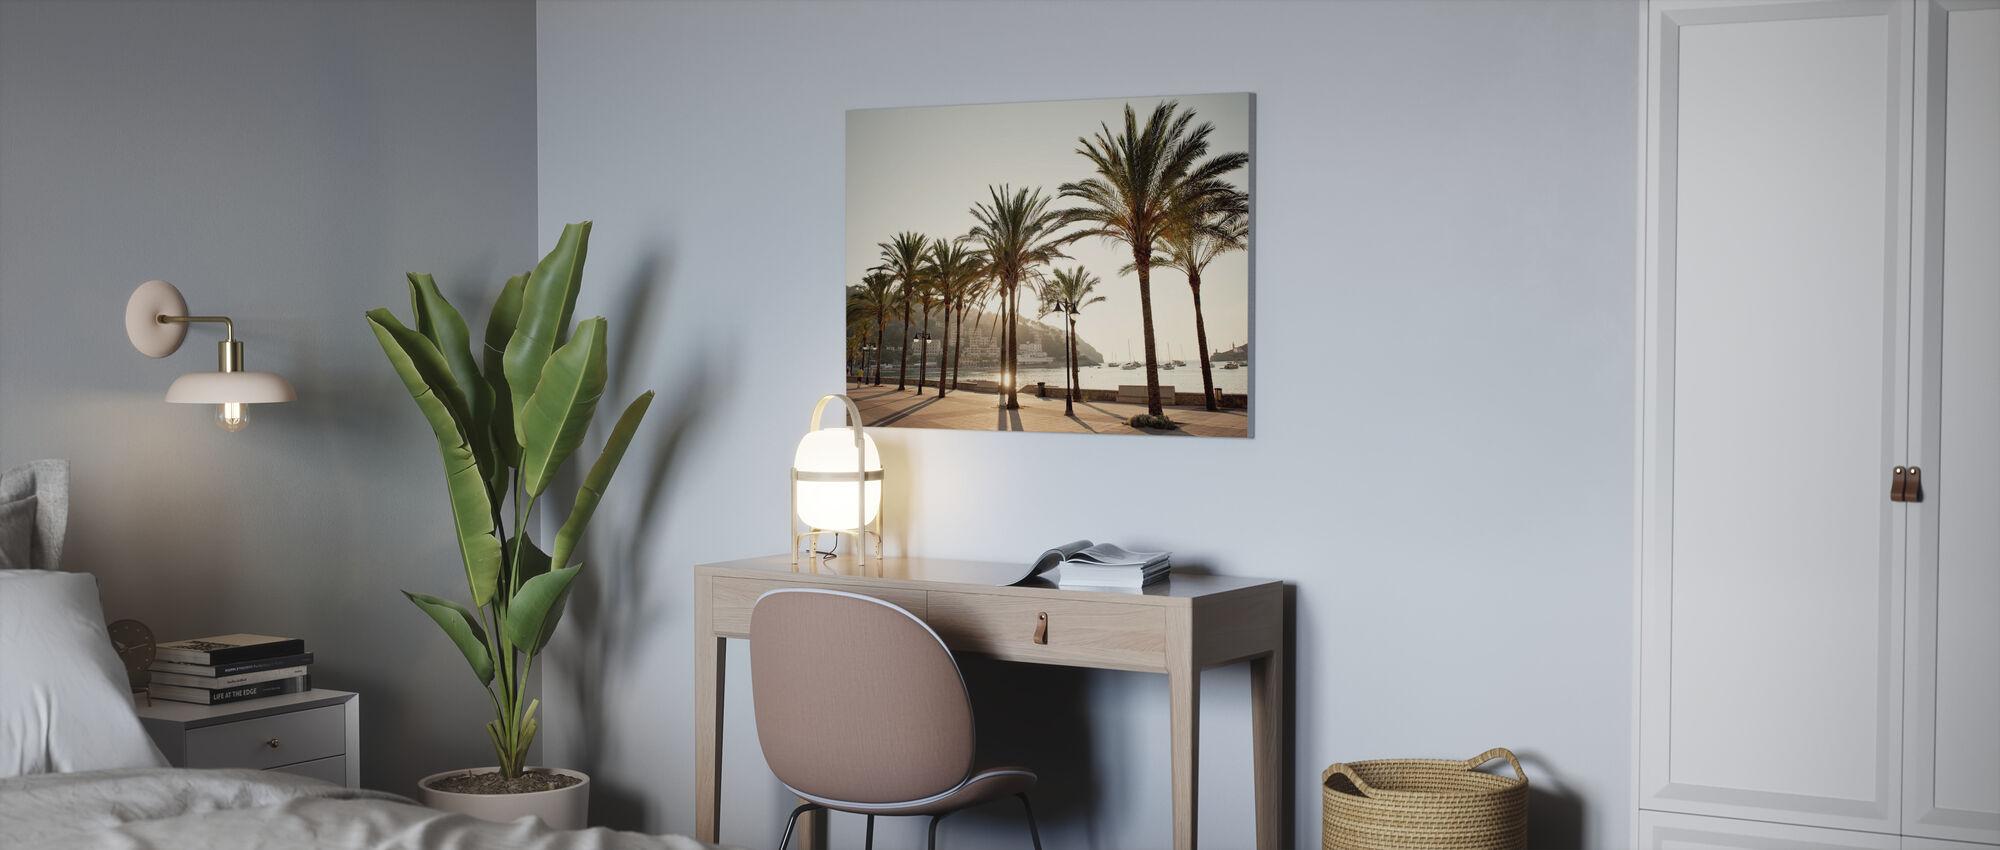 Mallorca strandpromenad - Canvastavla - Kontor